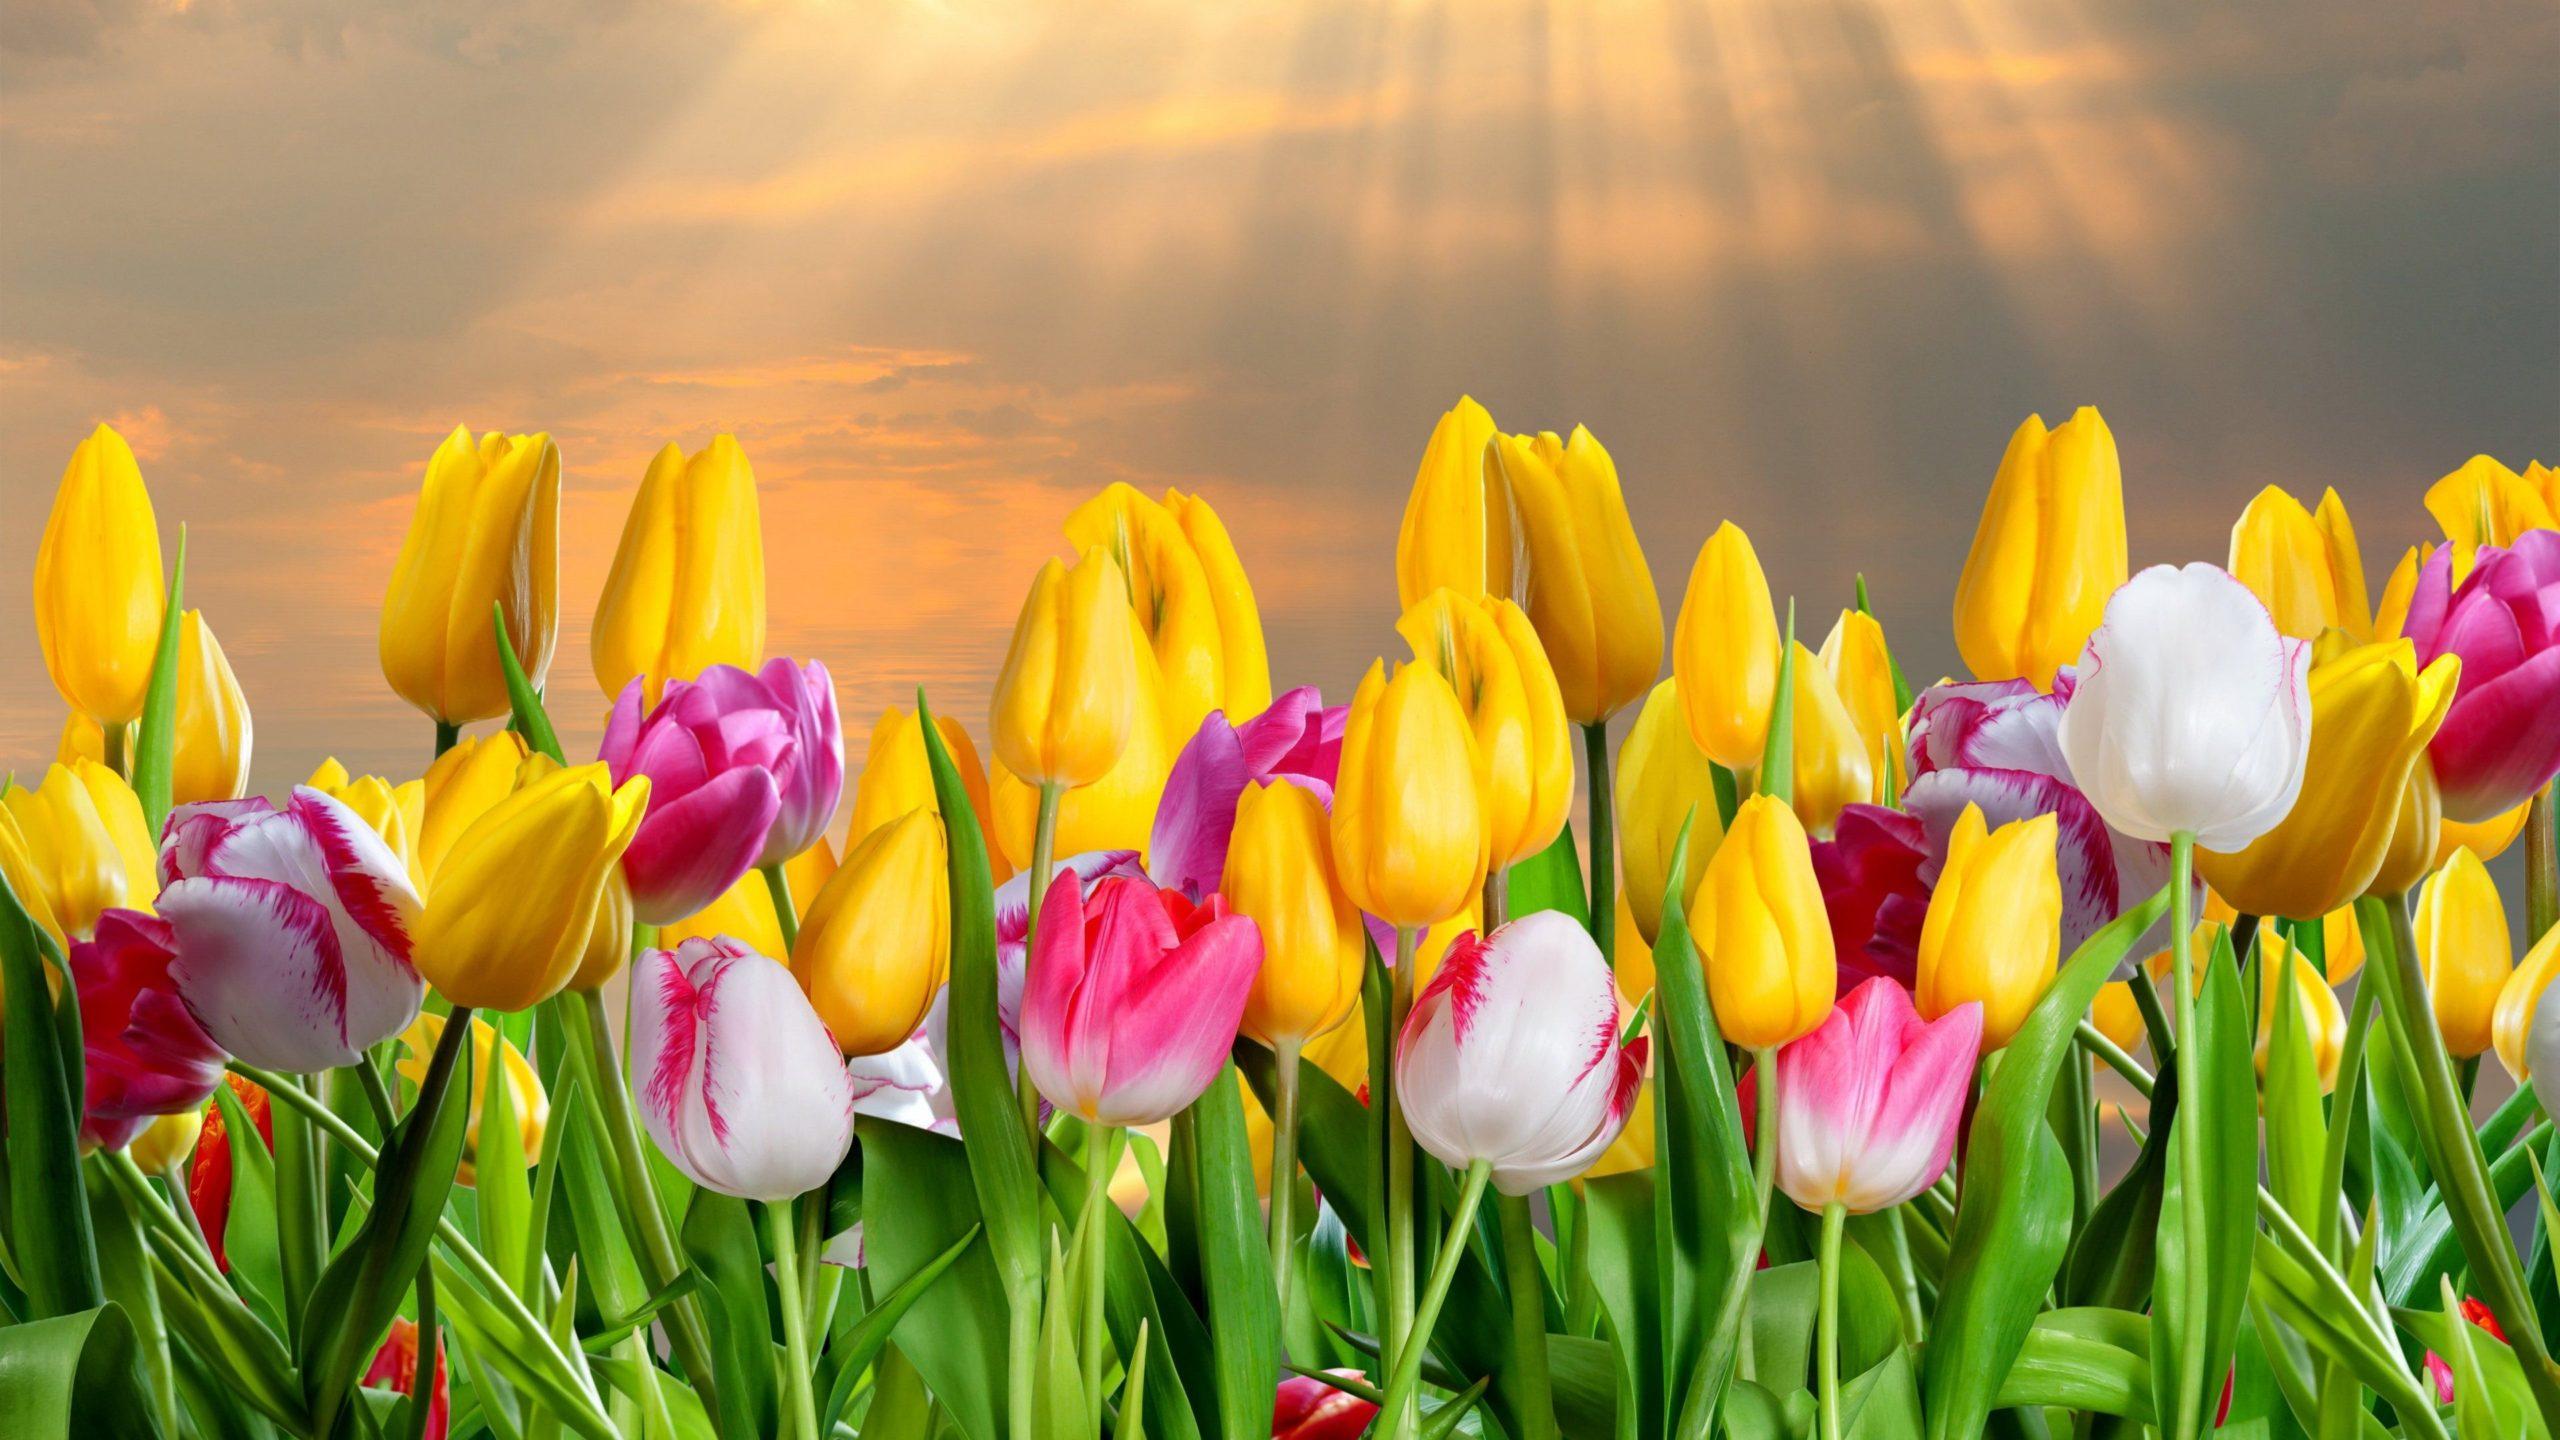 tulip flowers images 4k